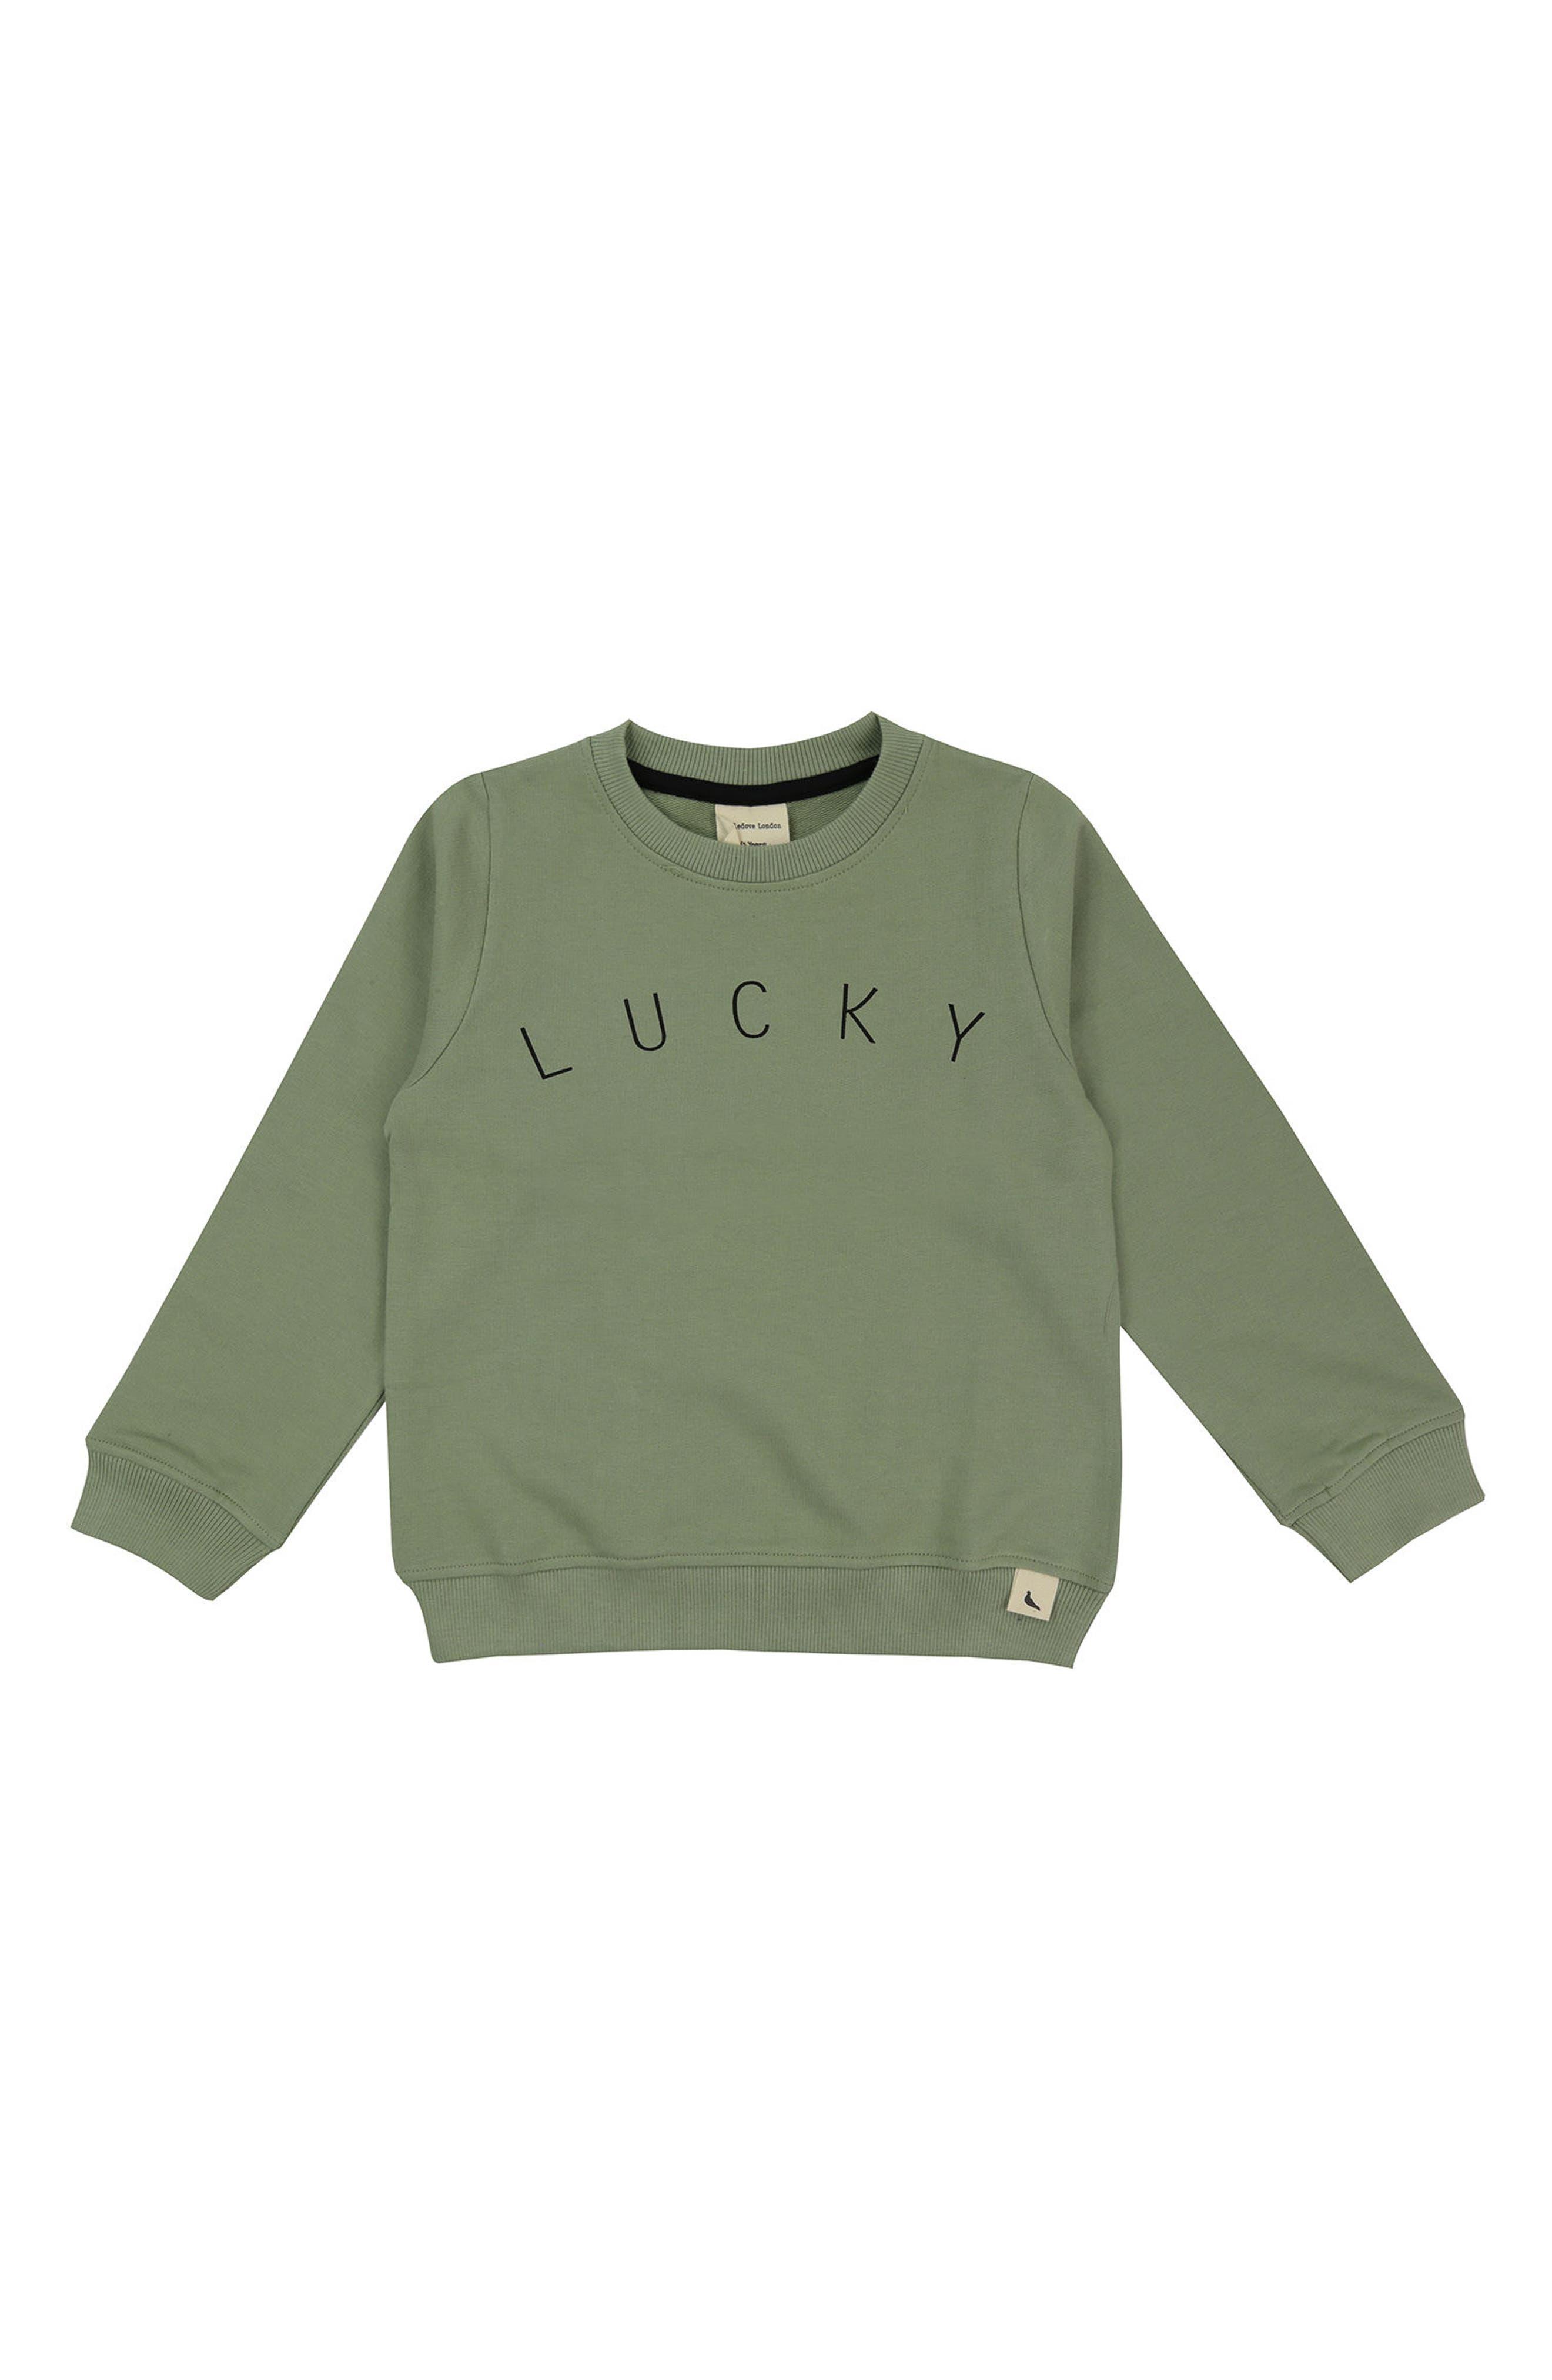 Lucky Sweatshirt,                             Main thumbnail 1, color,                             300